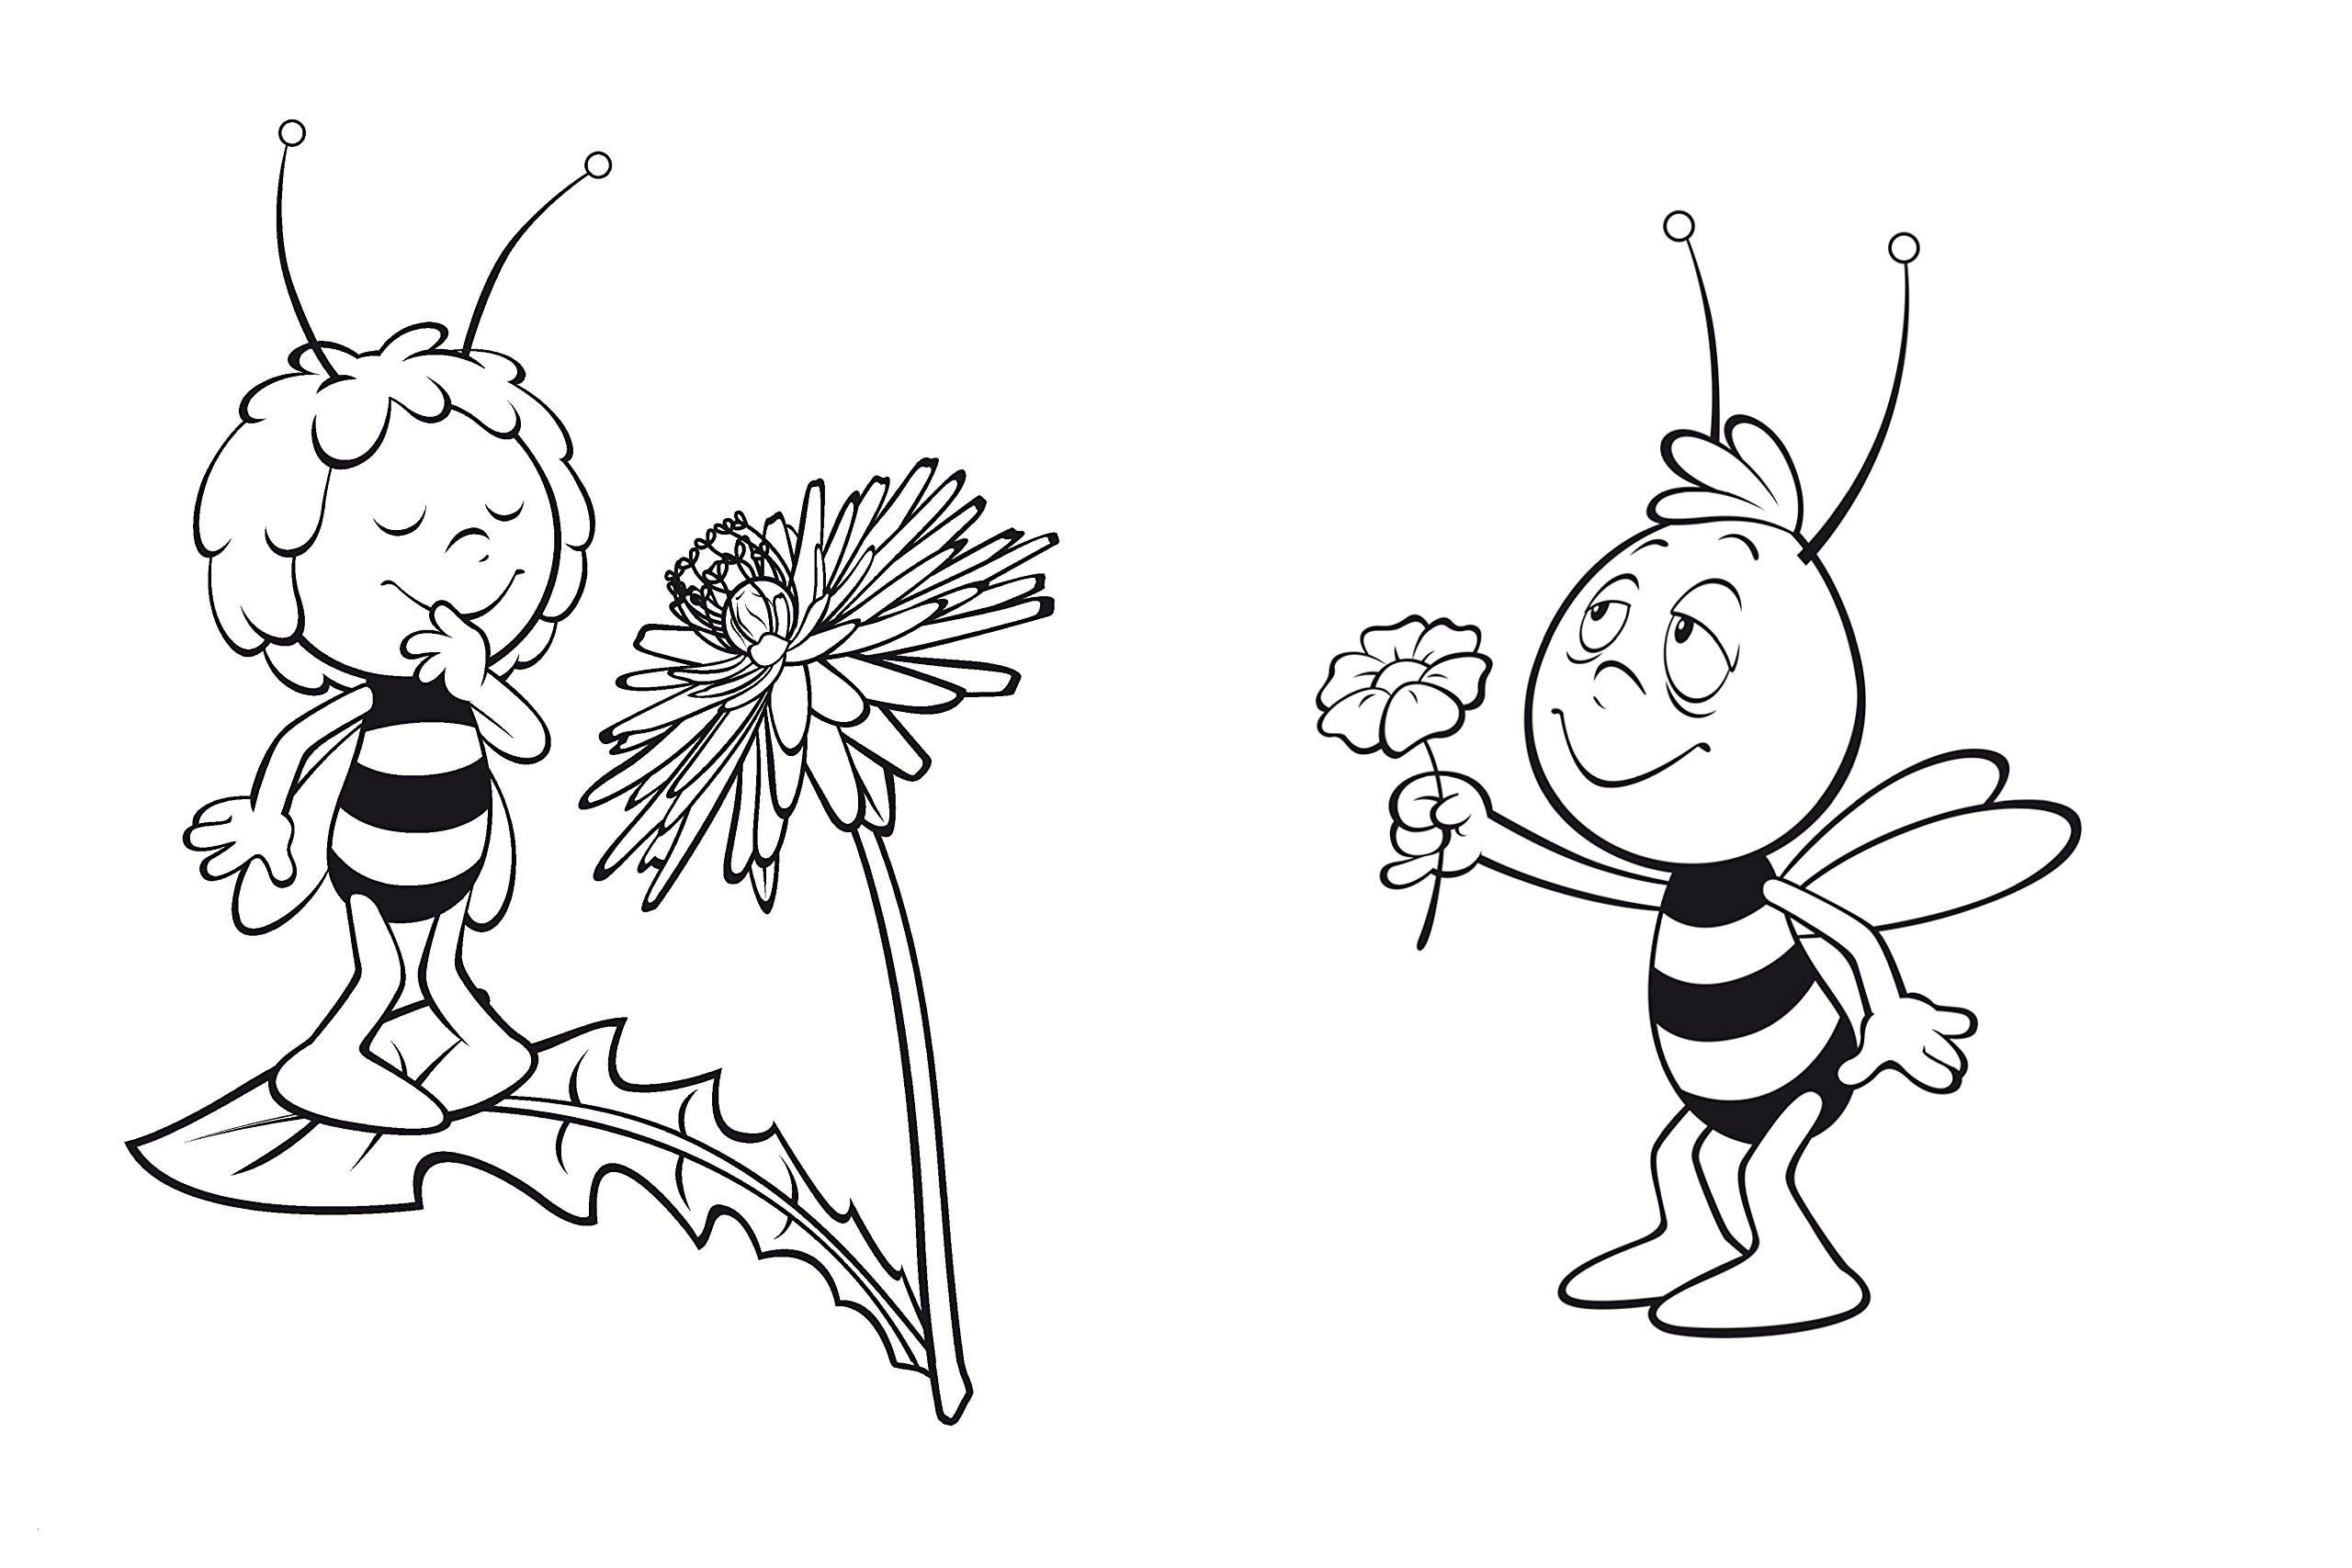 Biene Maja Ausmalbild Genial Bienen Ausmalbilder Schön 35 Ausmalbilder Biene Maja Und Willi Sammlung